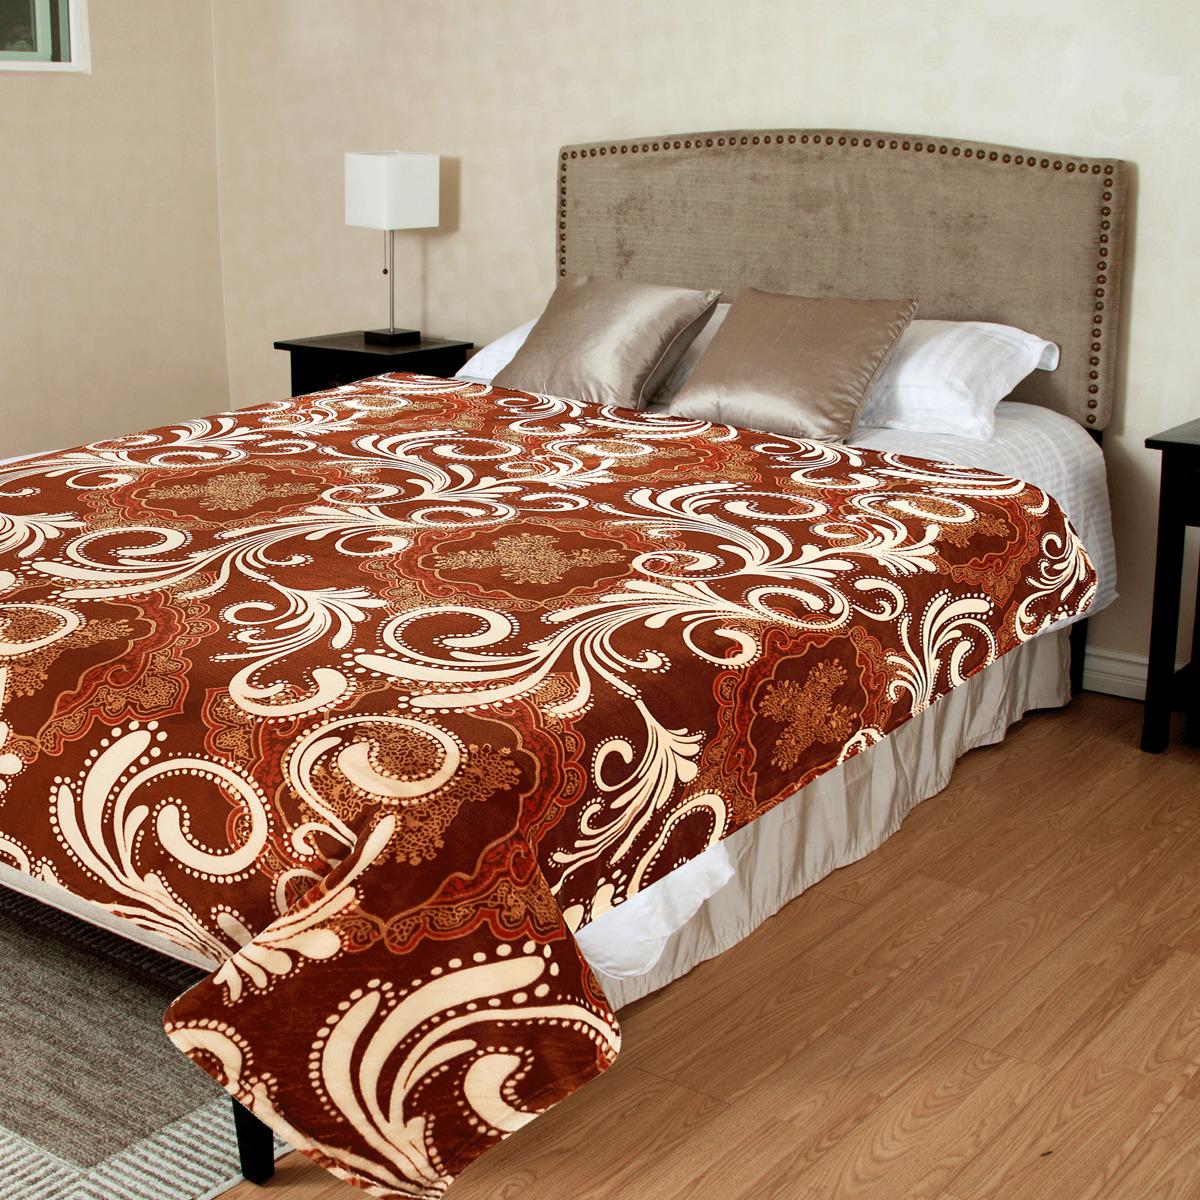 "Плед TexRepublic ""Узор"", цвет: коричневый, бежевый, 180 х 210 см"